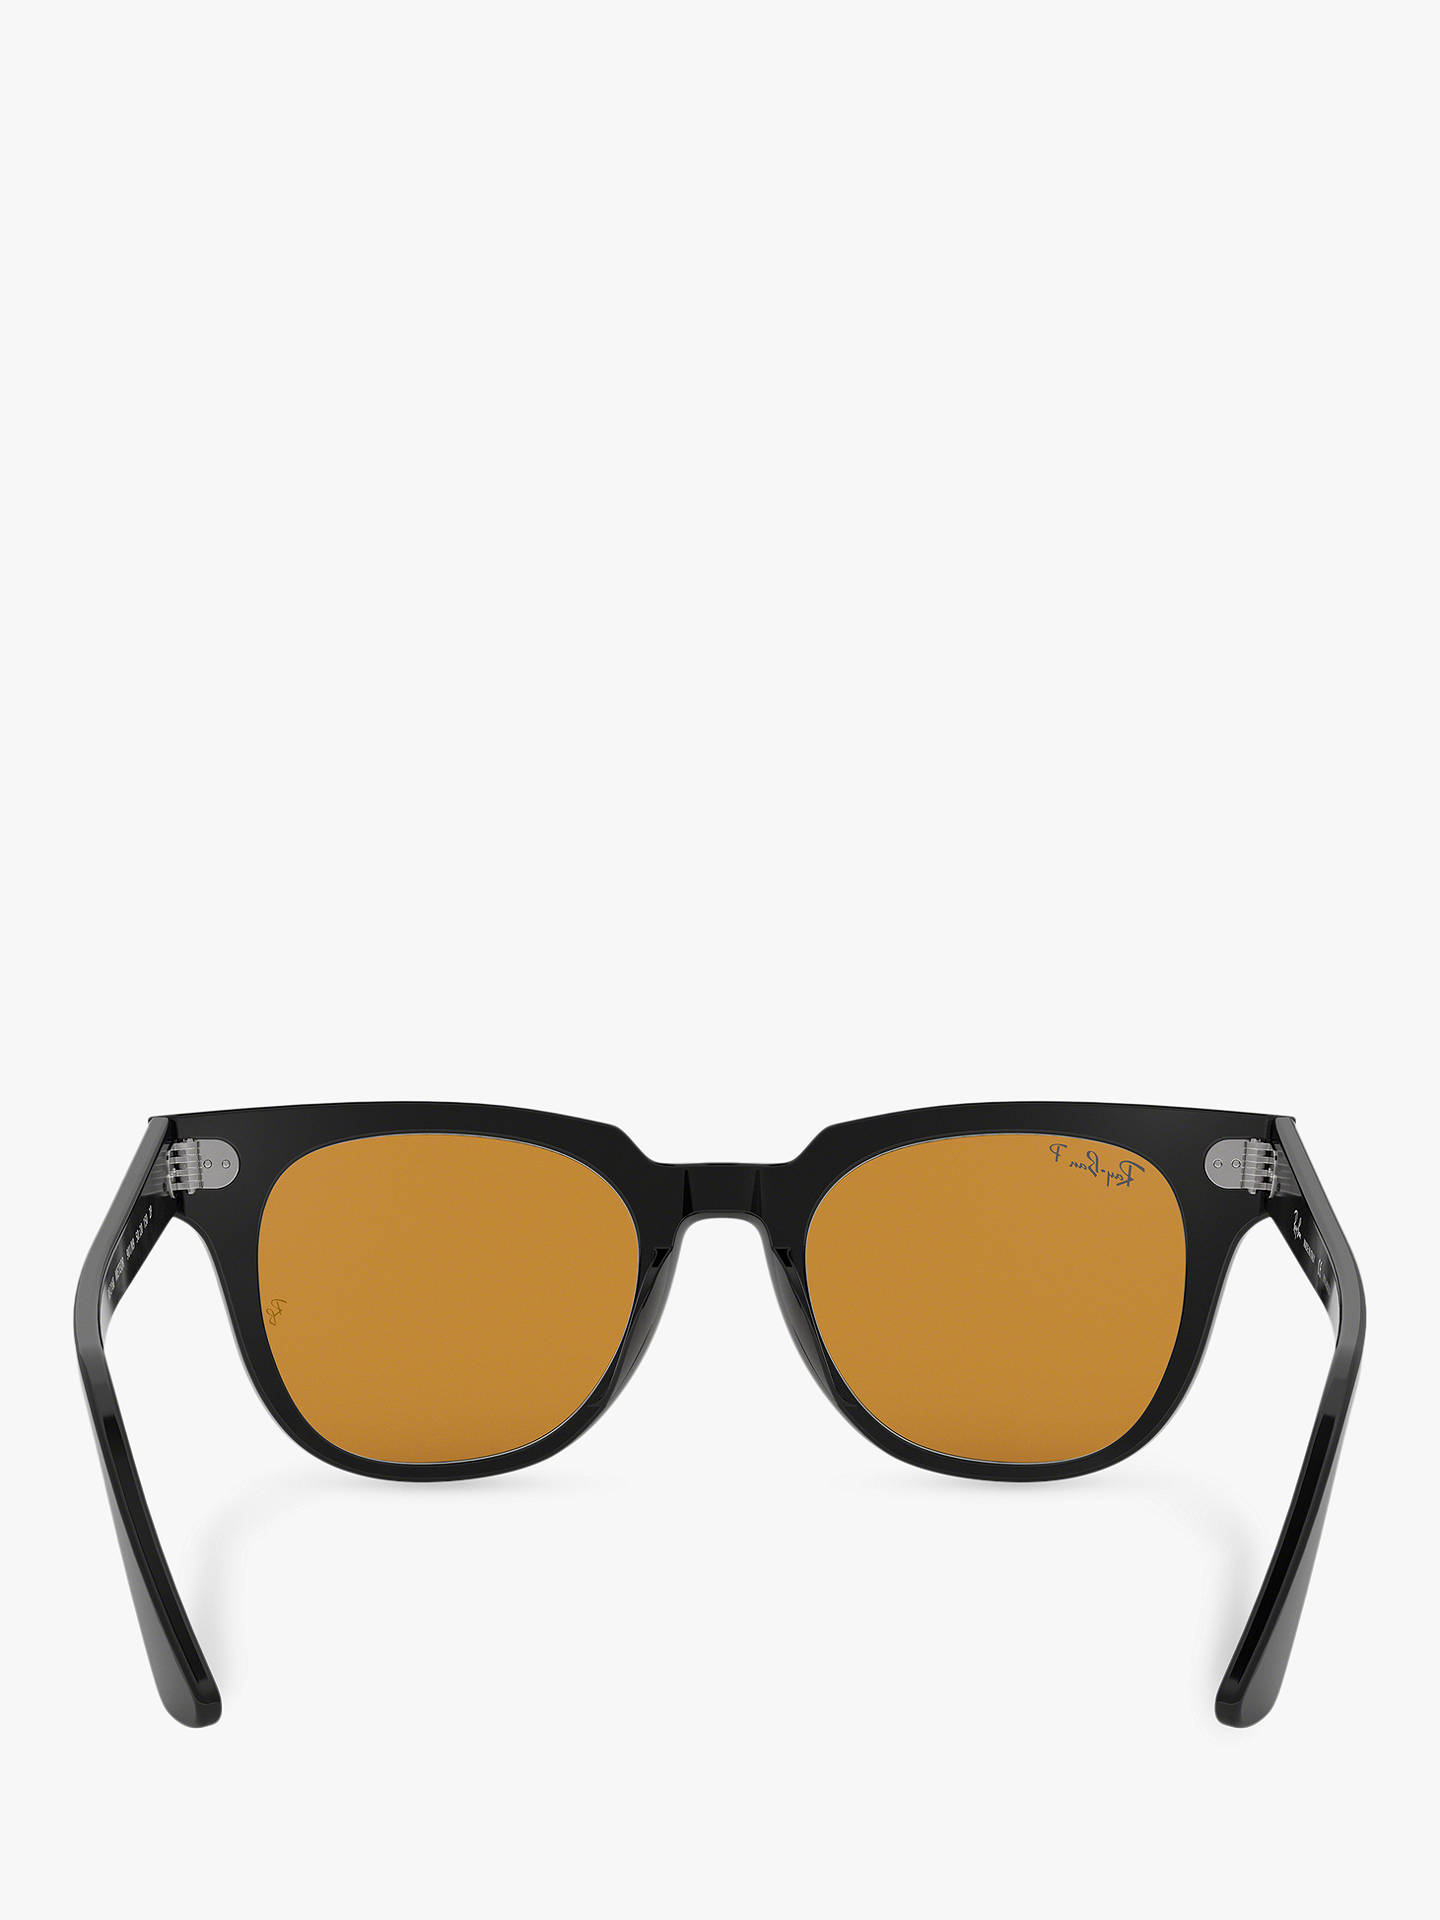 ab25f413507 Ray-Ban RB2168 Unisex Polarised Square Sunglasses at John Lewis ...